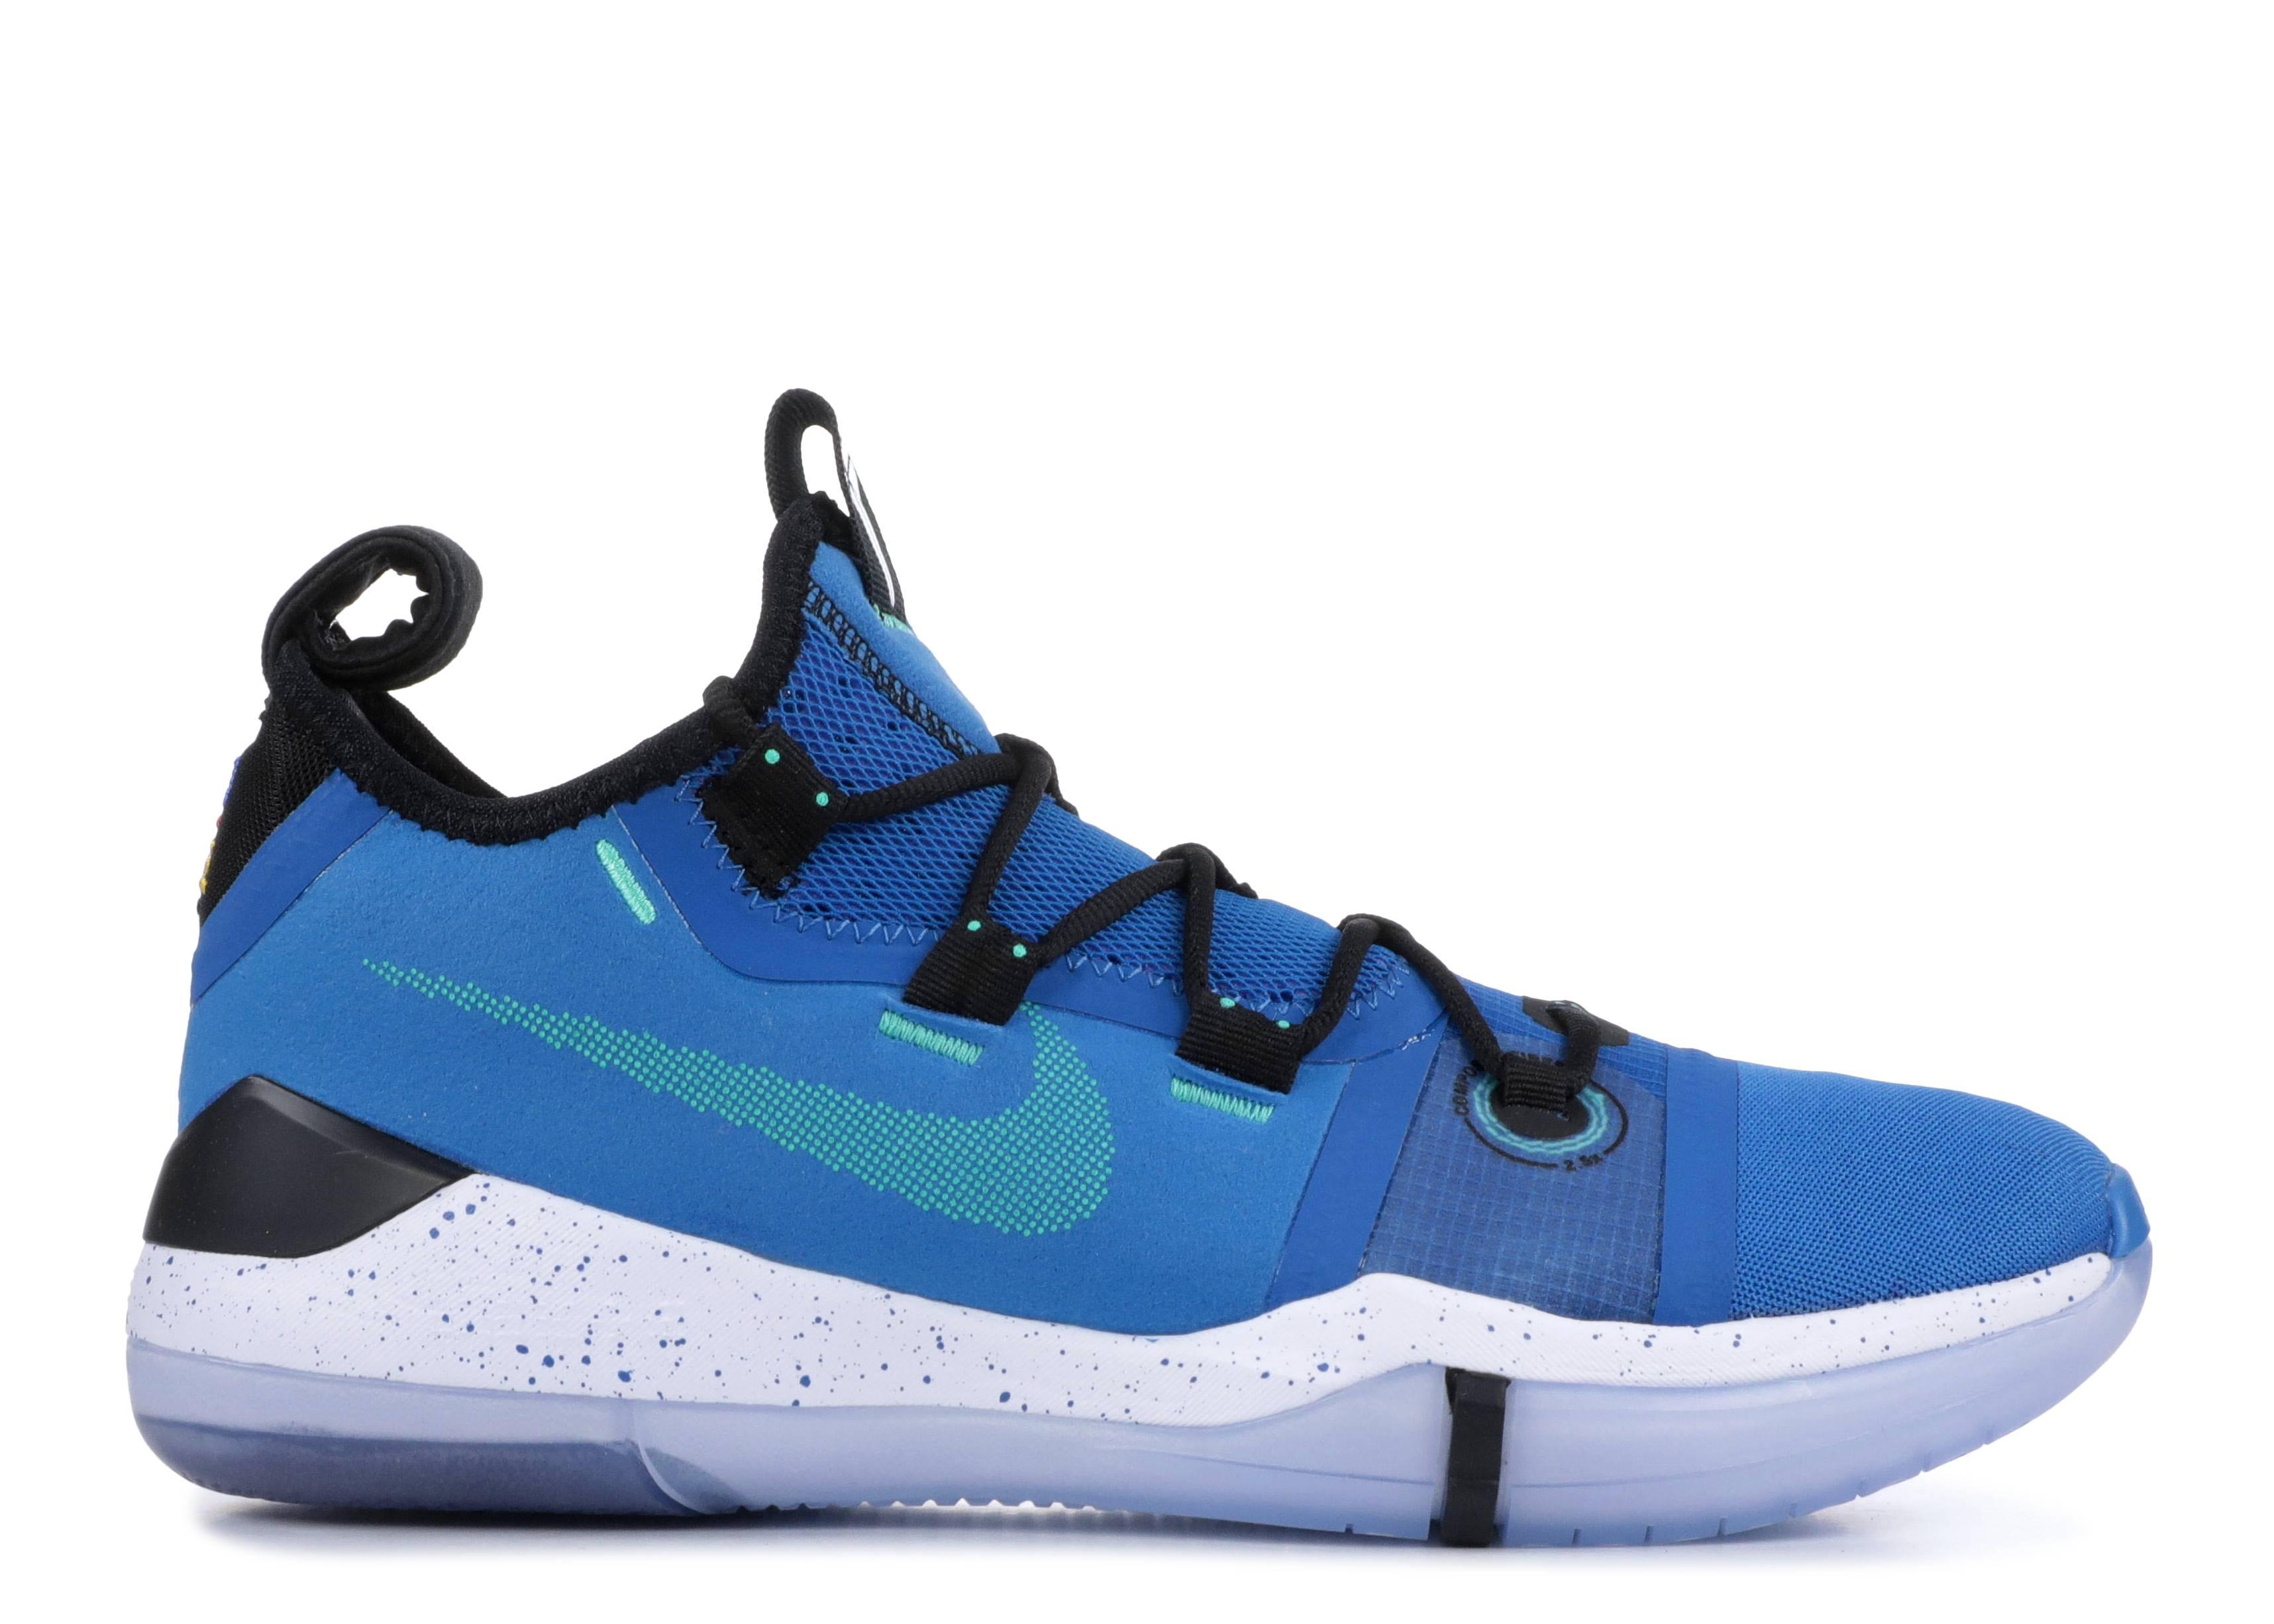 official photos 9501d f353f Nike Kobe Ad - Nike - av3556 400 - military blue sunblush   Flight Club